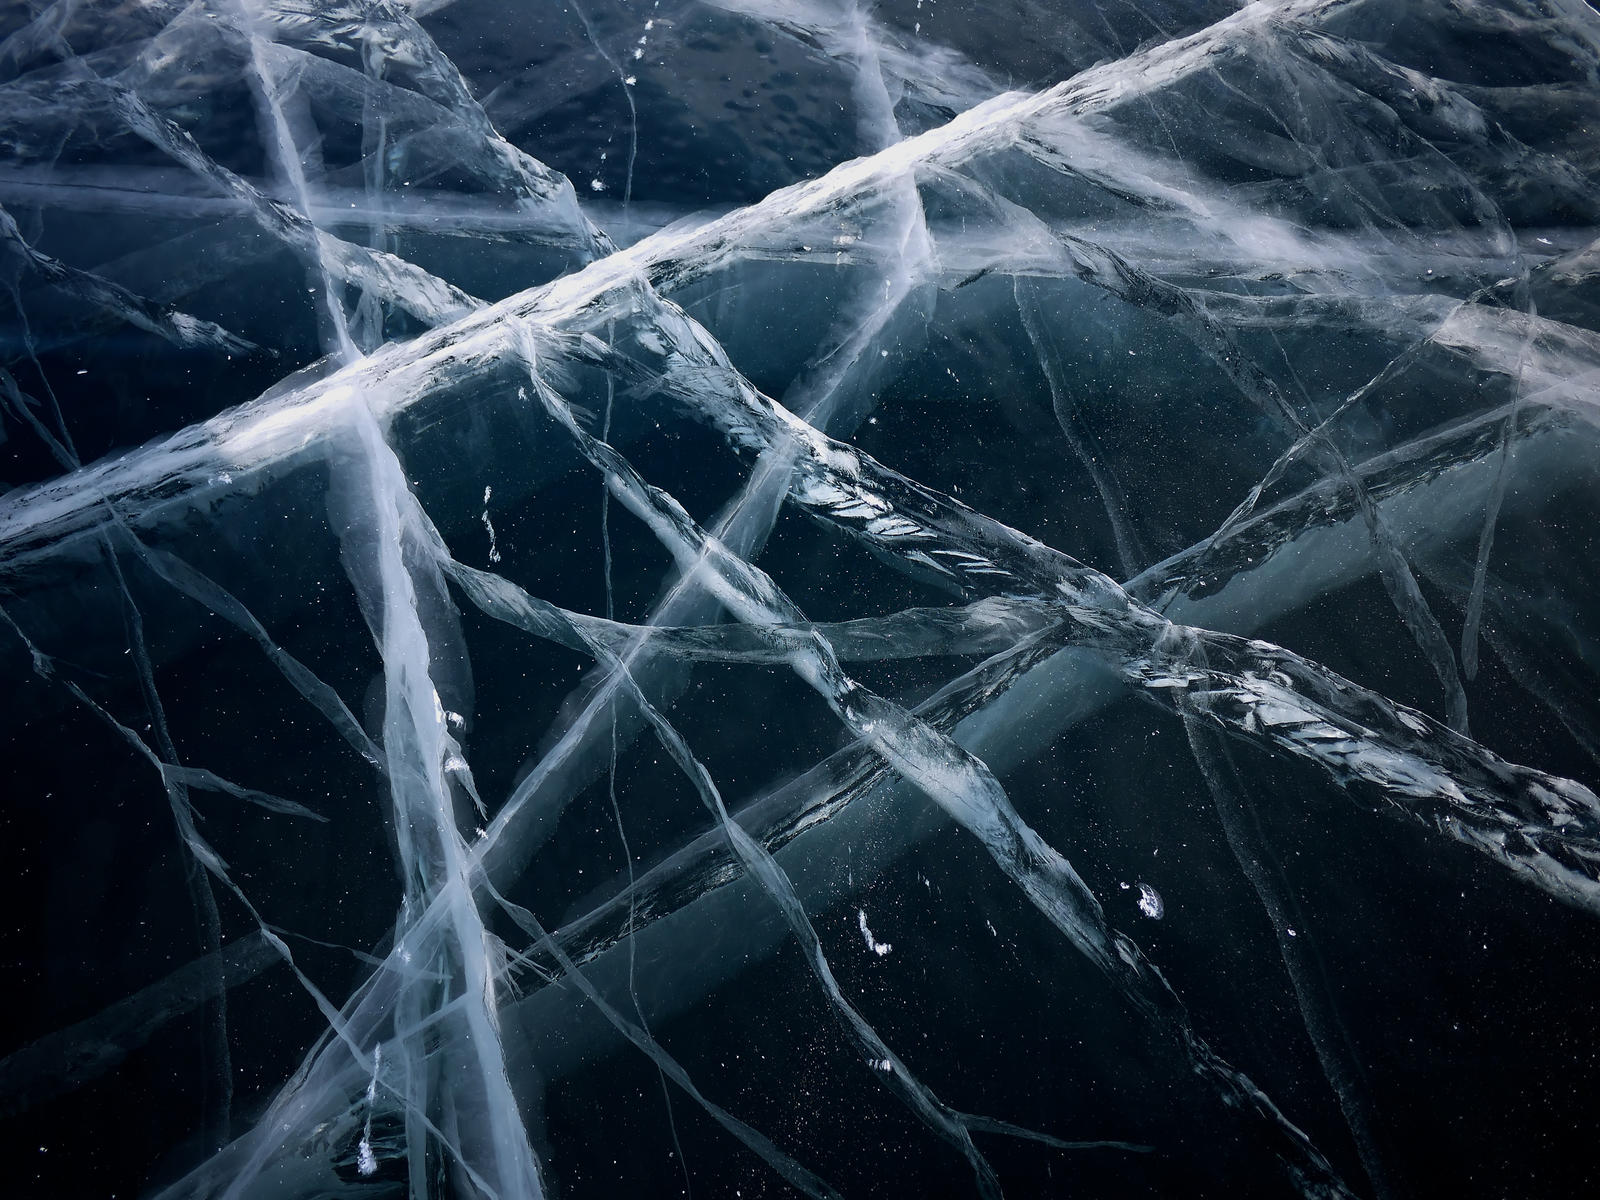 Glyph Of Cracked Ice